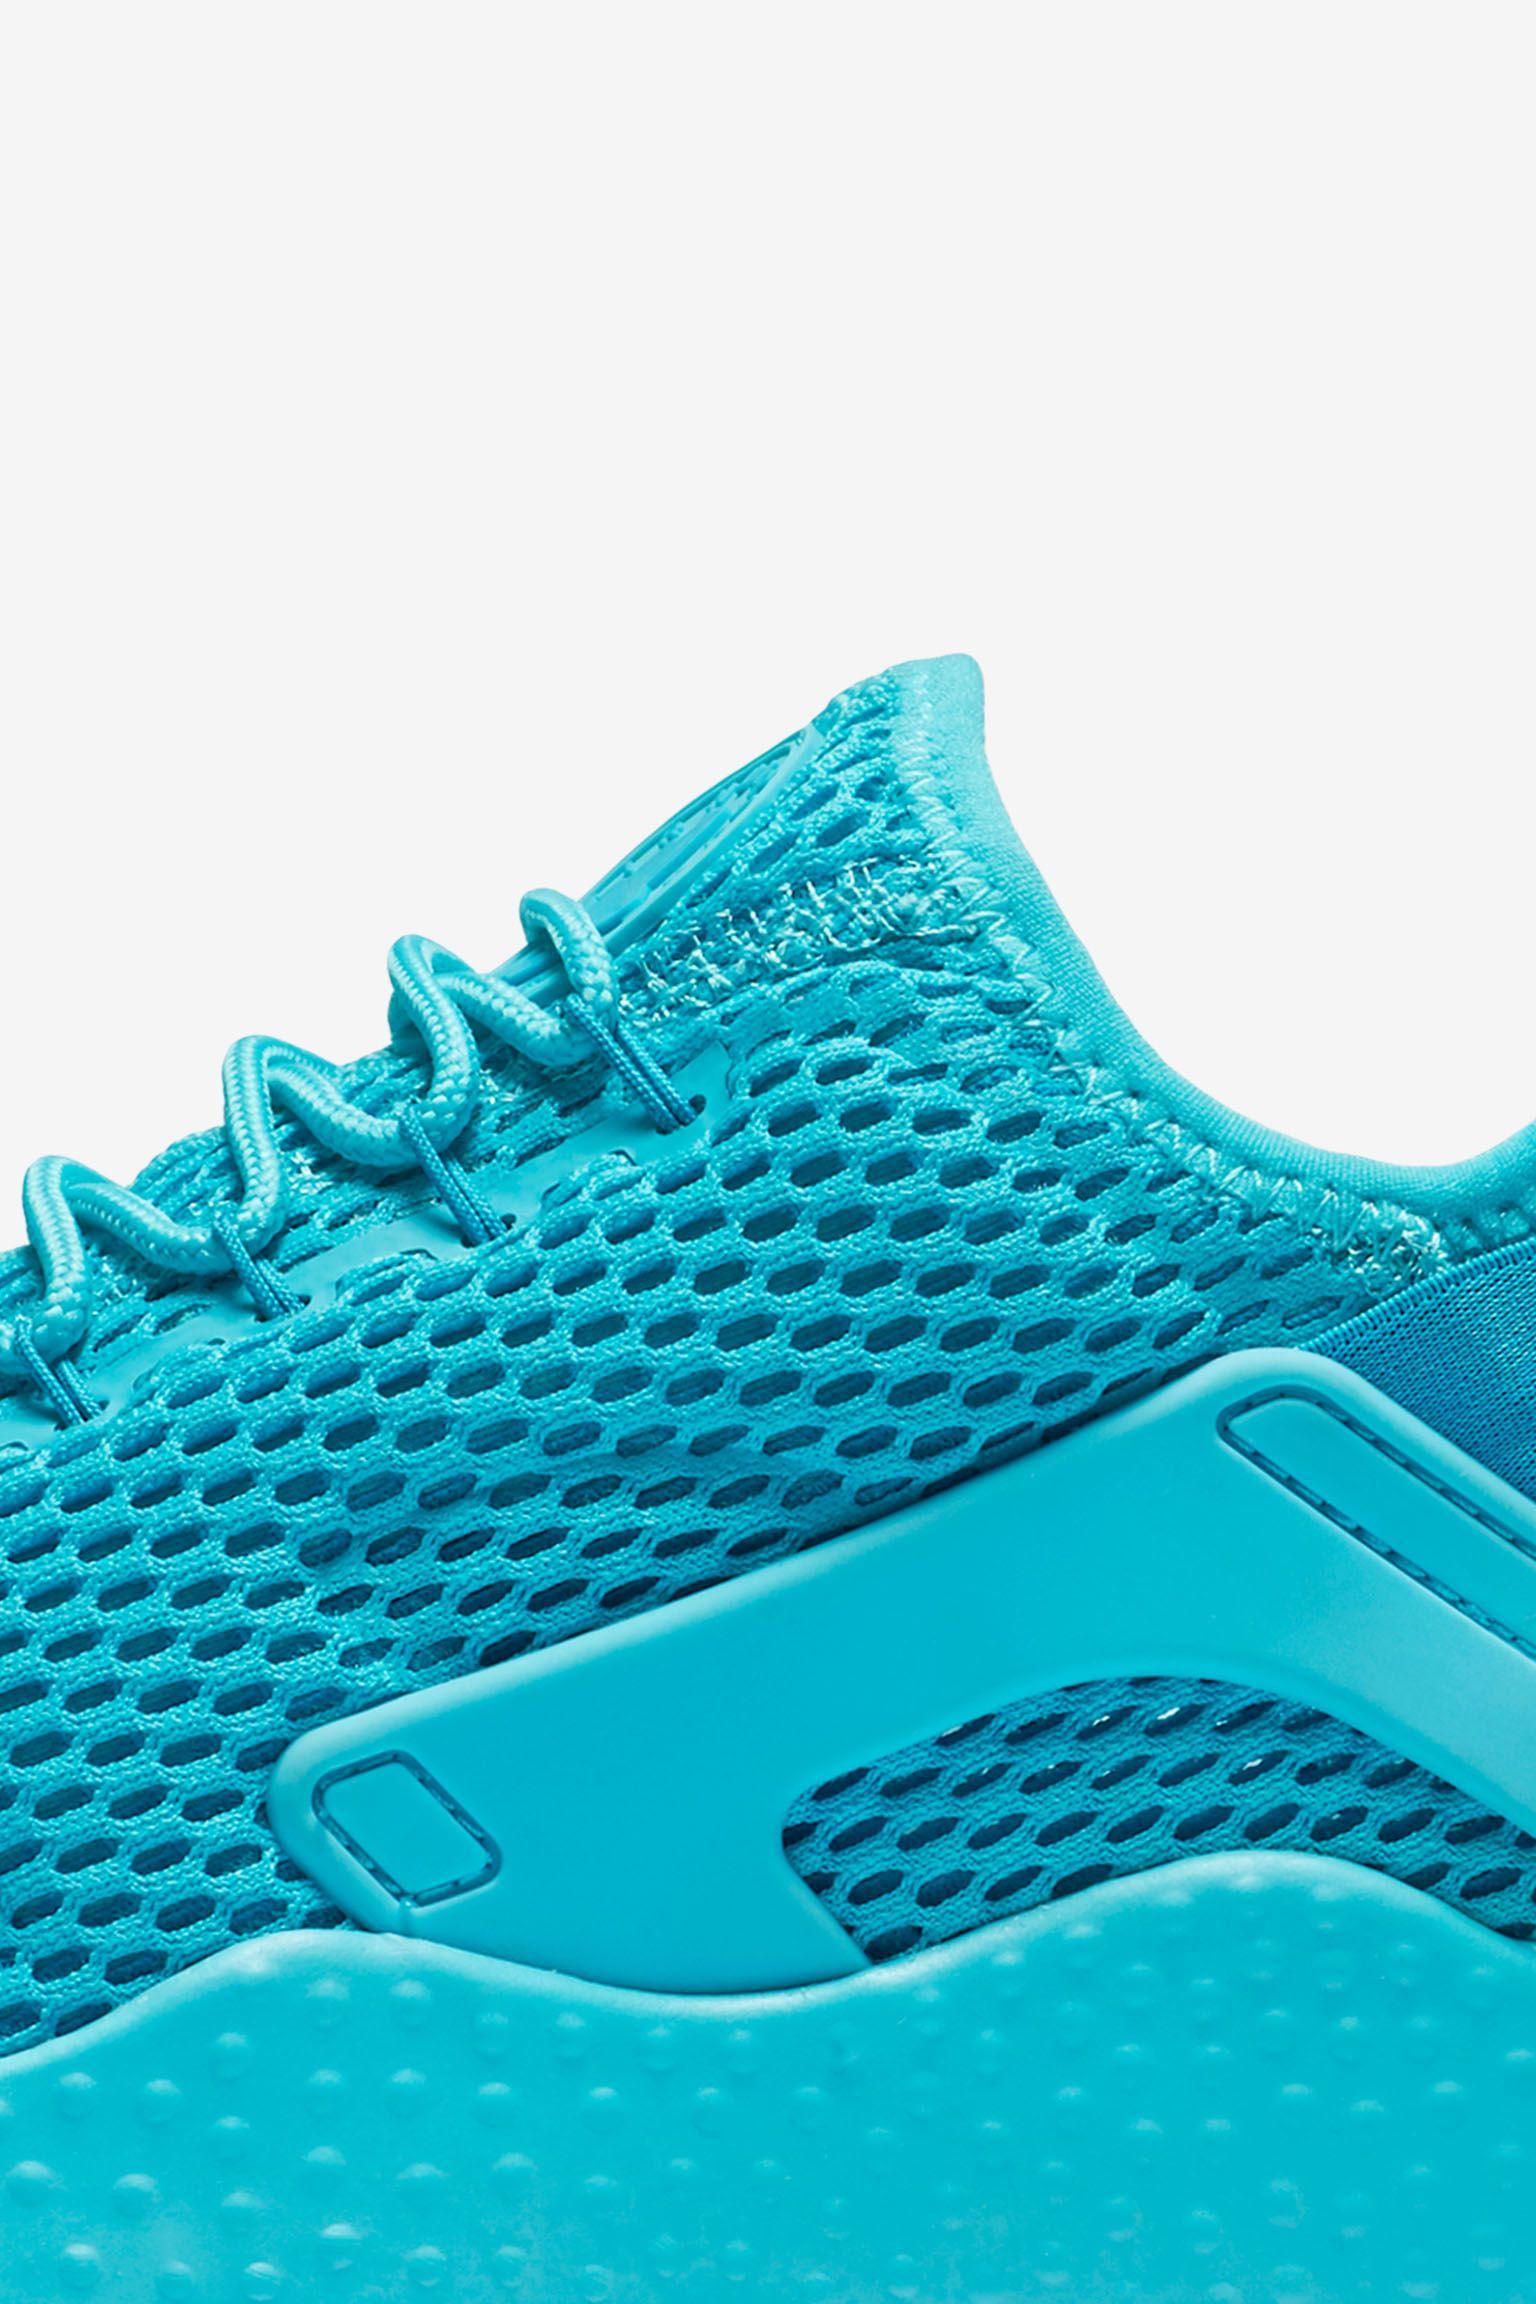 Women's Nike Air Huarache Ultra Breathe 'Gamma Blue'